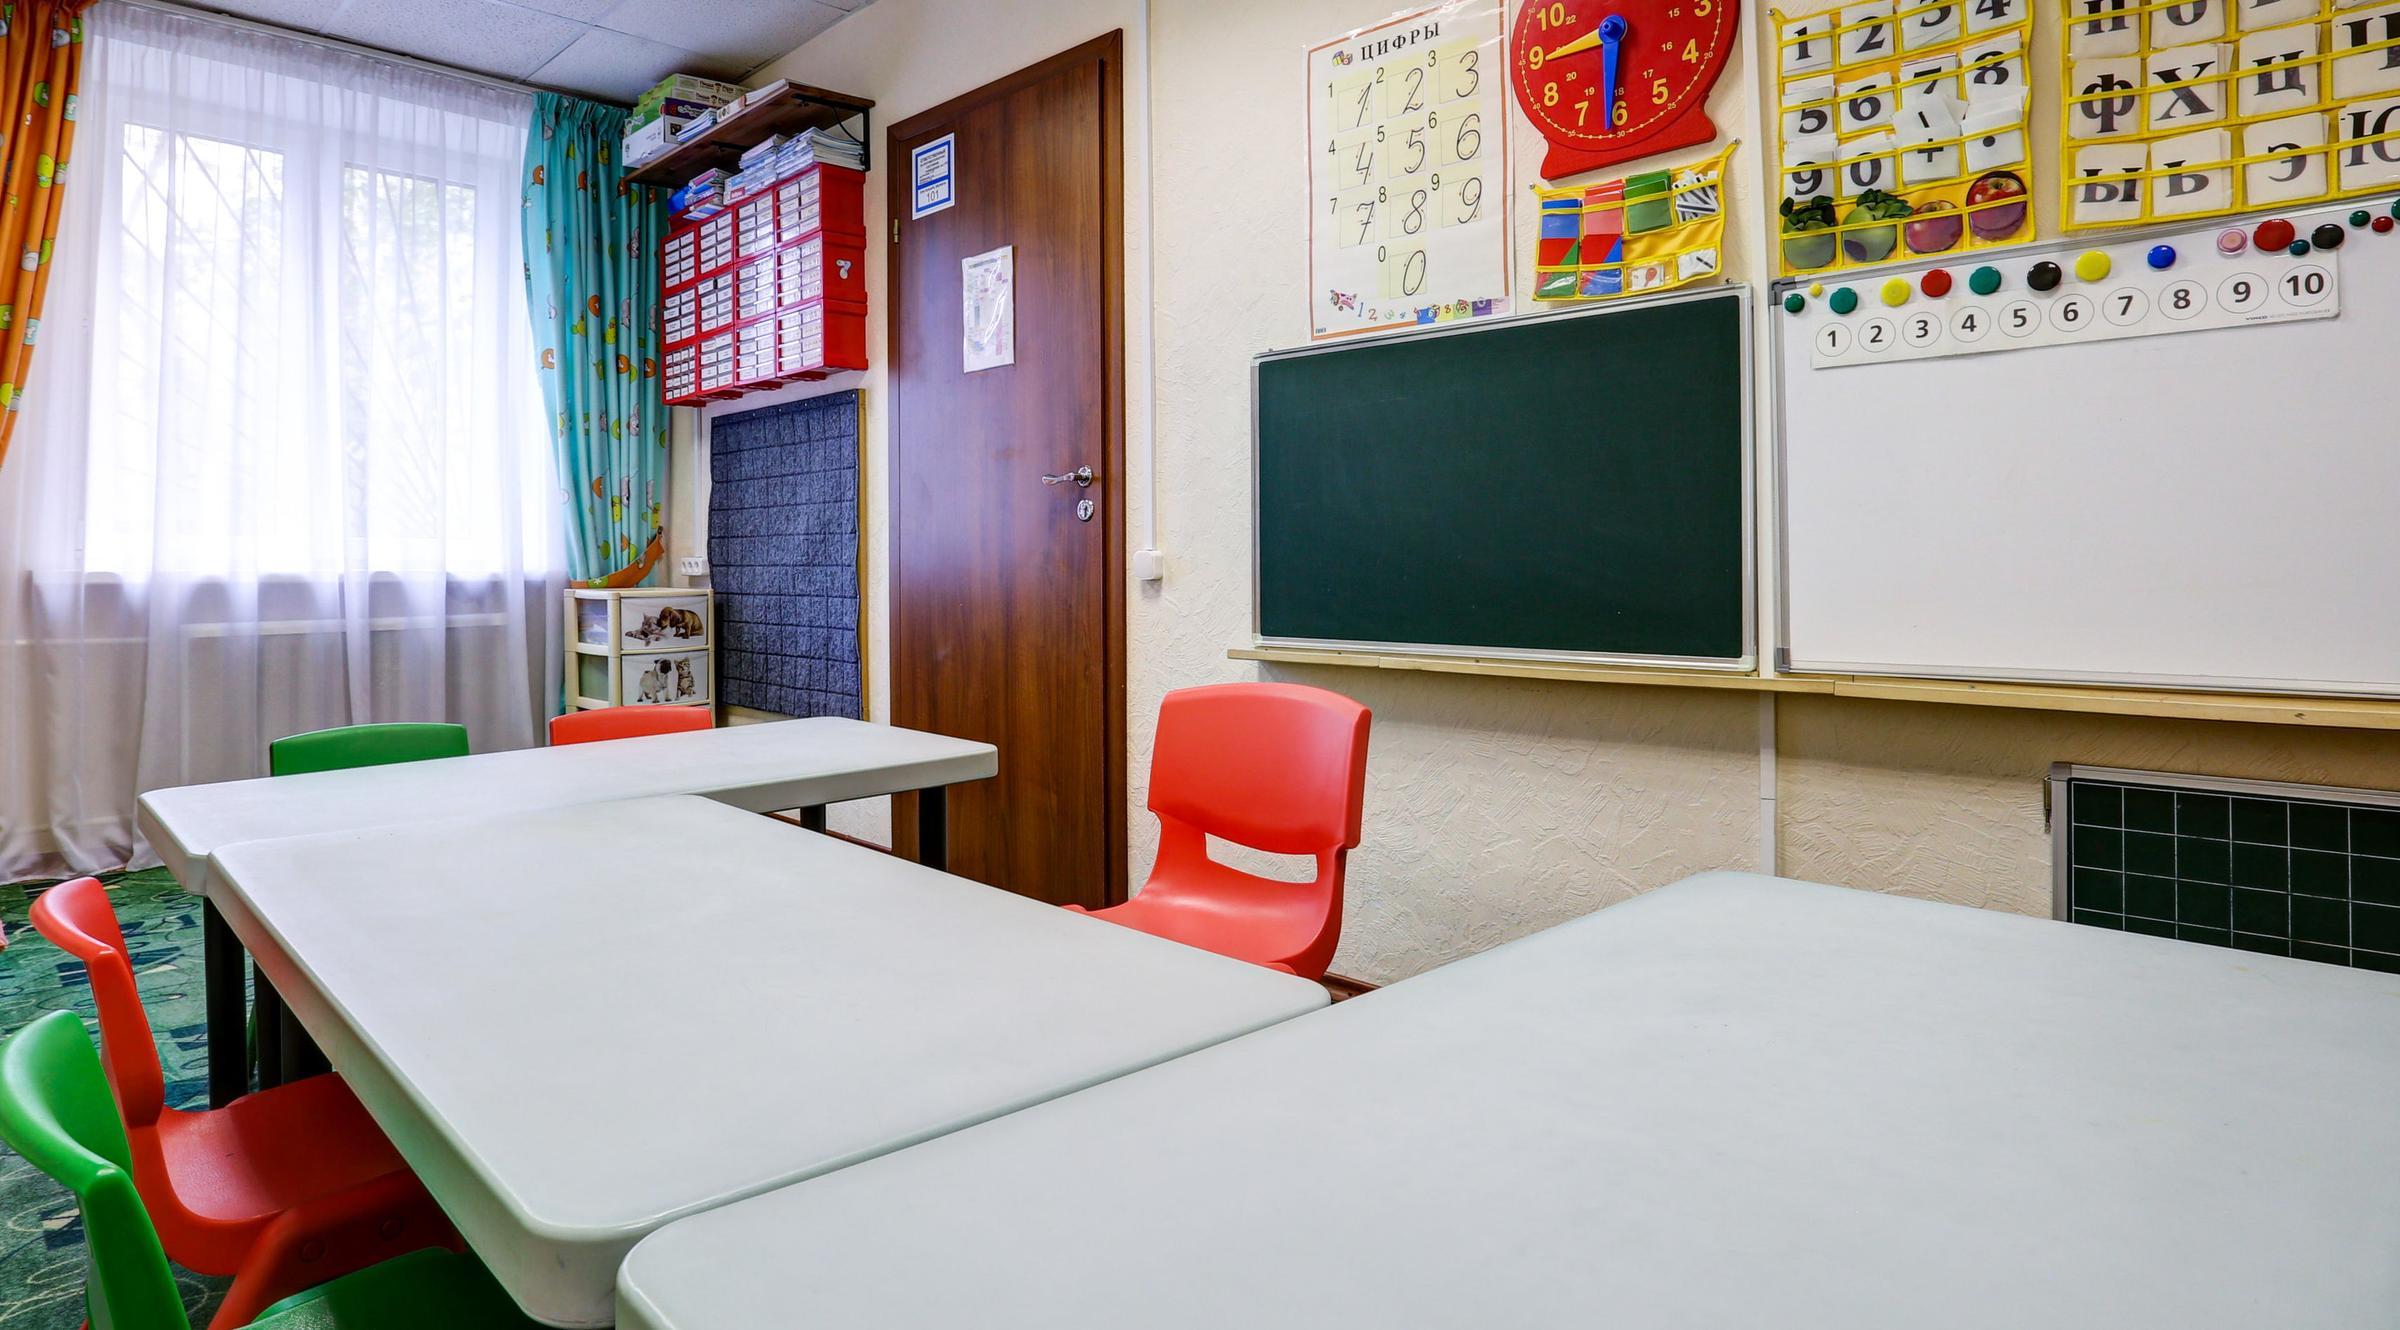 фотография Детского центра Капитошка на метро Фонвизинская